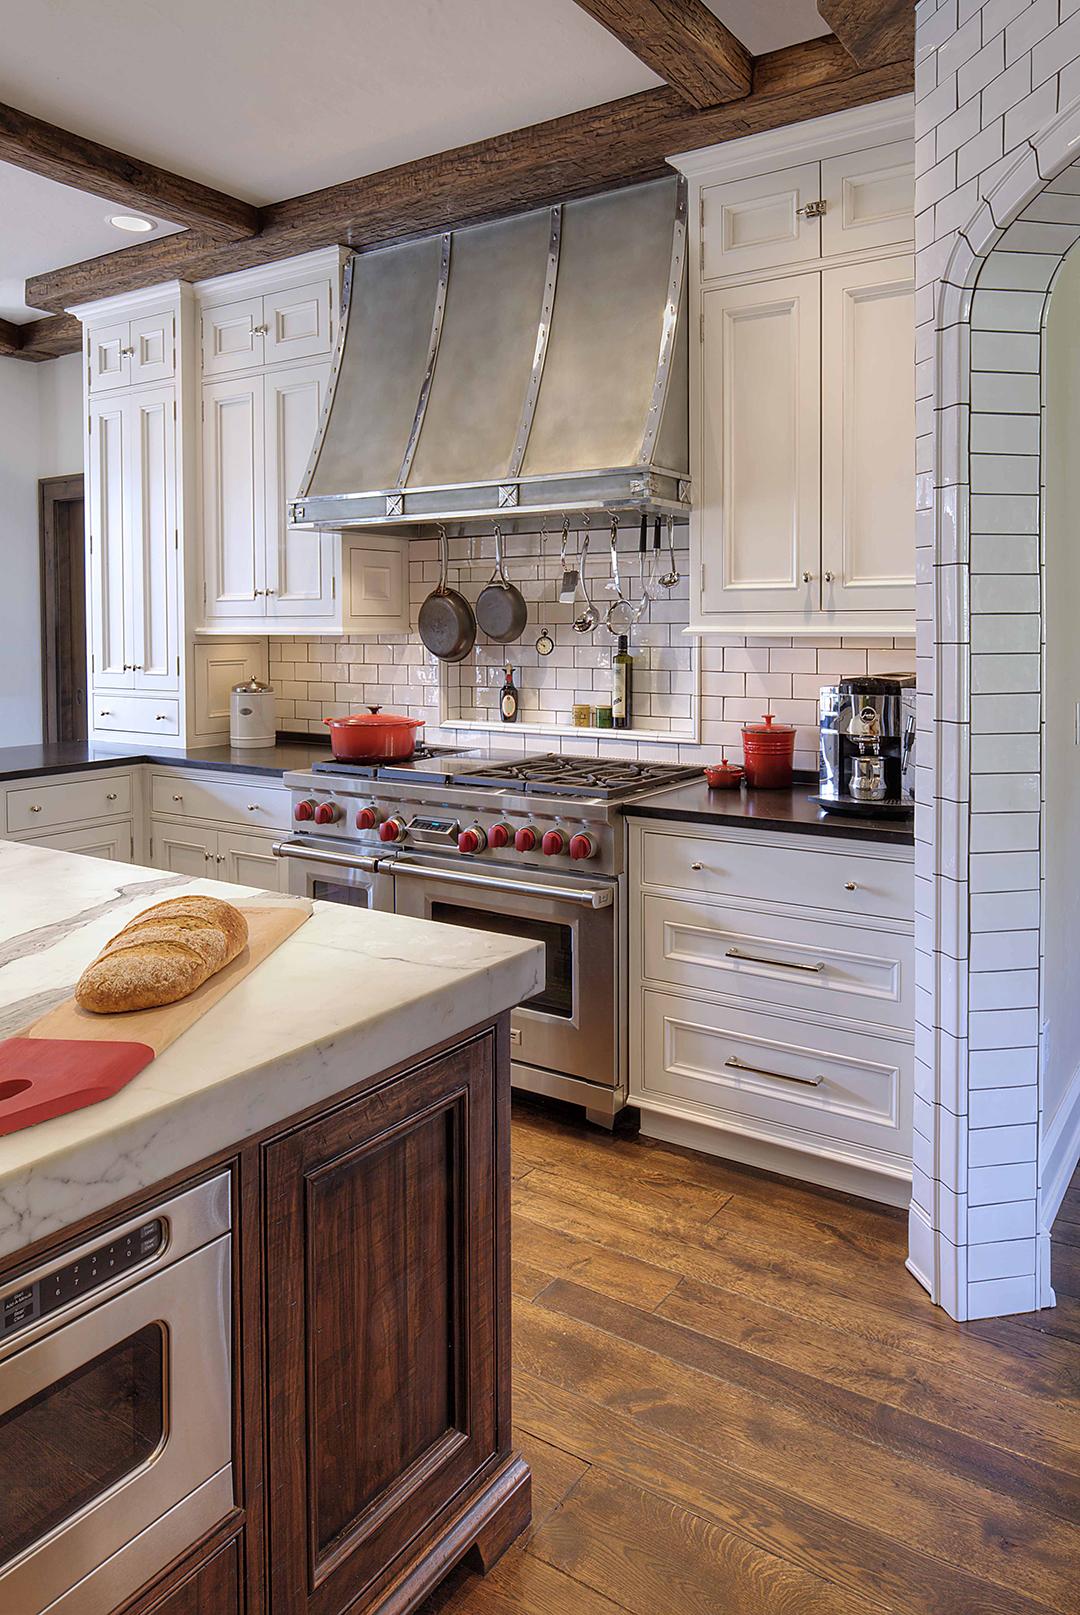 1b. Cramer Ave kitchen(sharpened).jpg